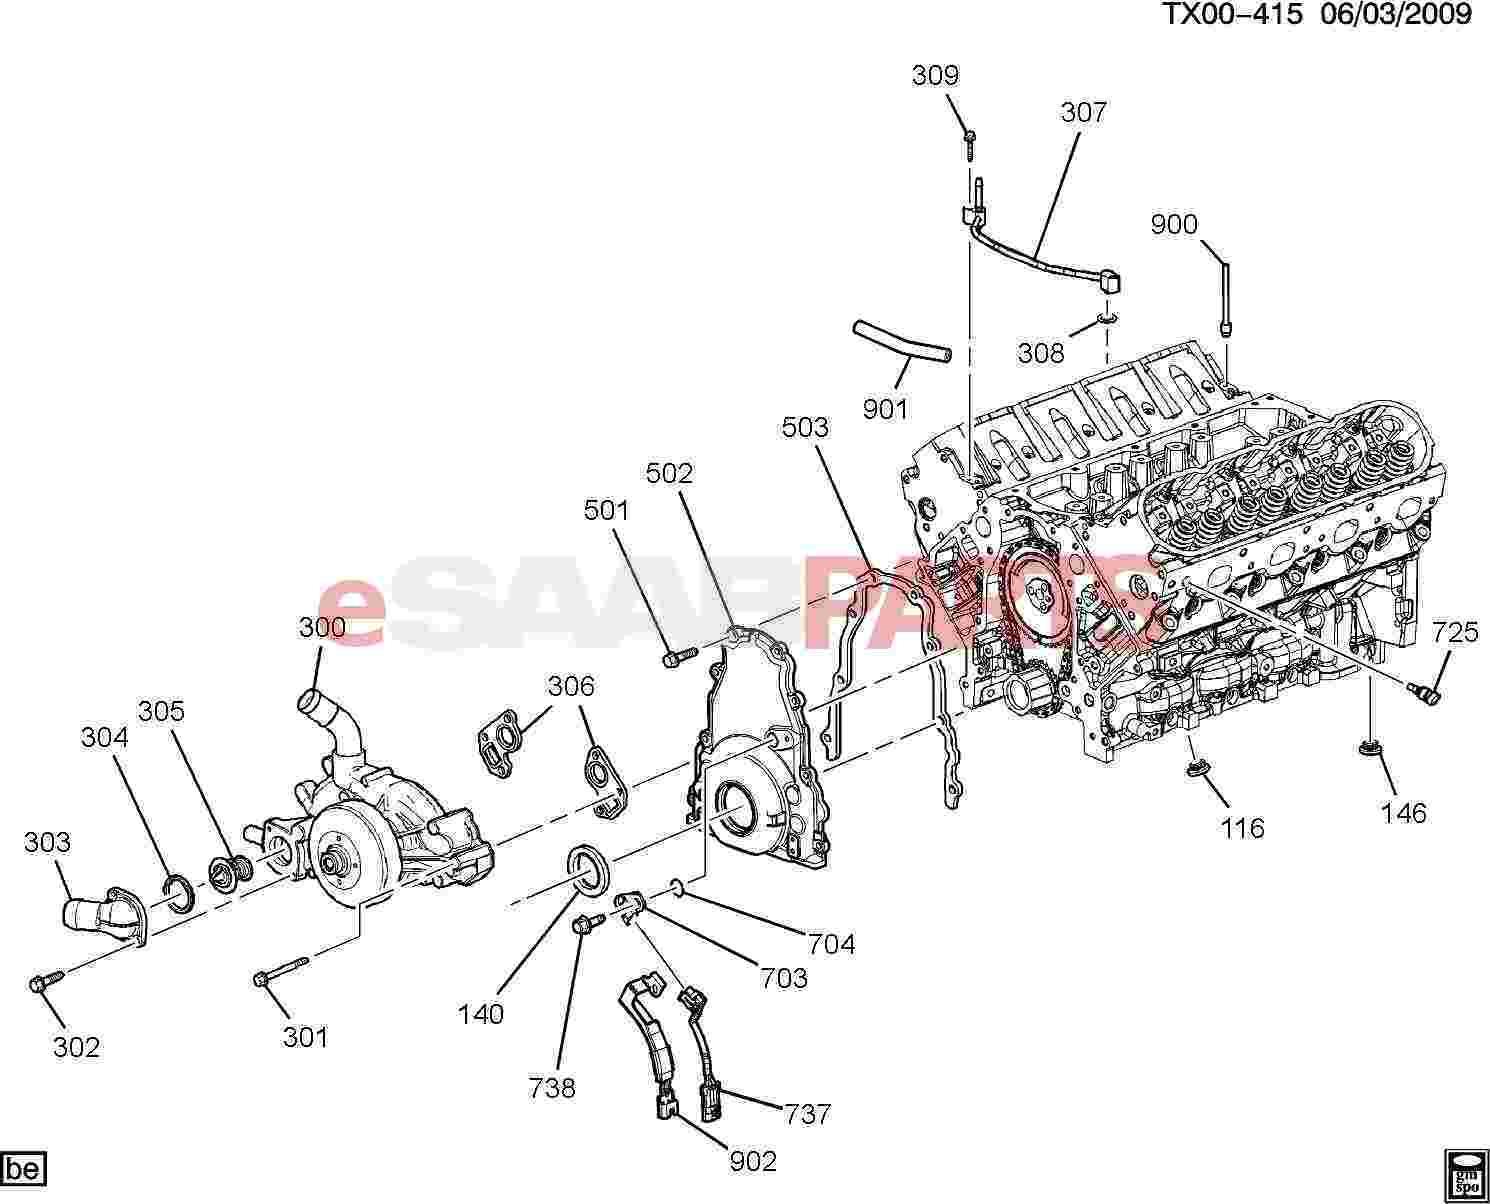 hight resolution of diagram image 308